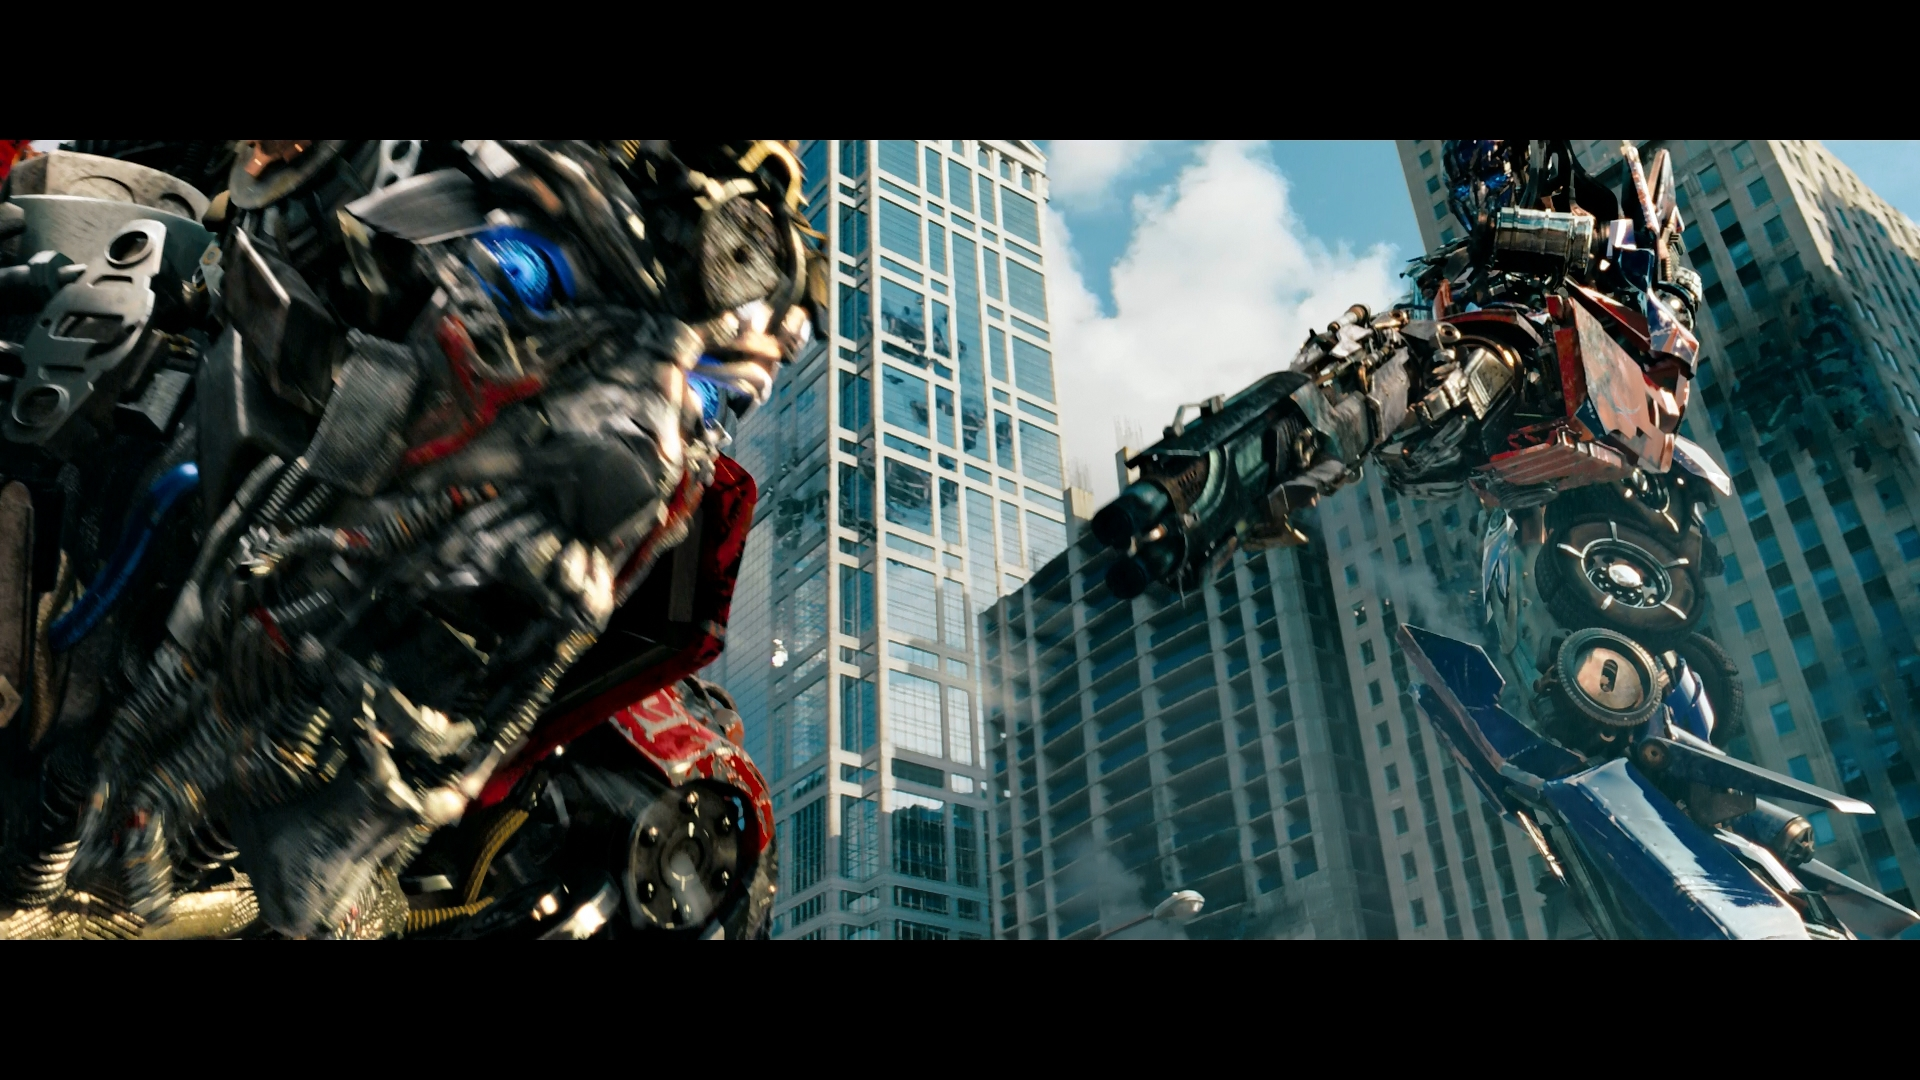 sentinel prime (movie) | teletraan i: the transformers wiki | fandom